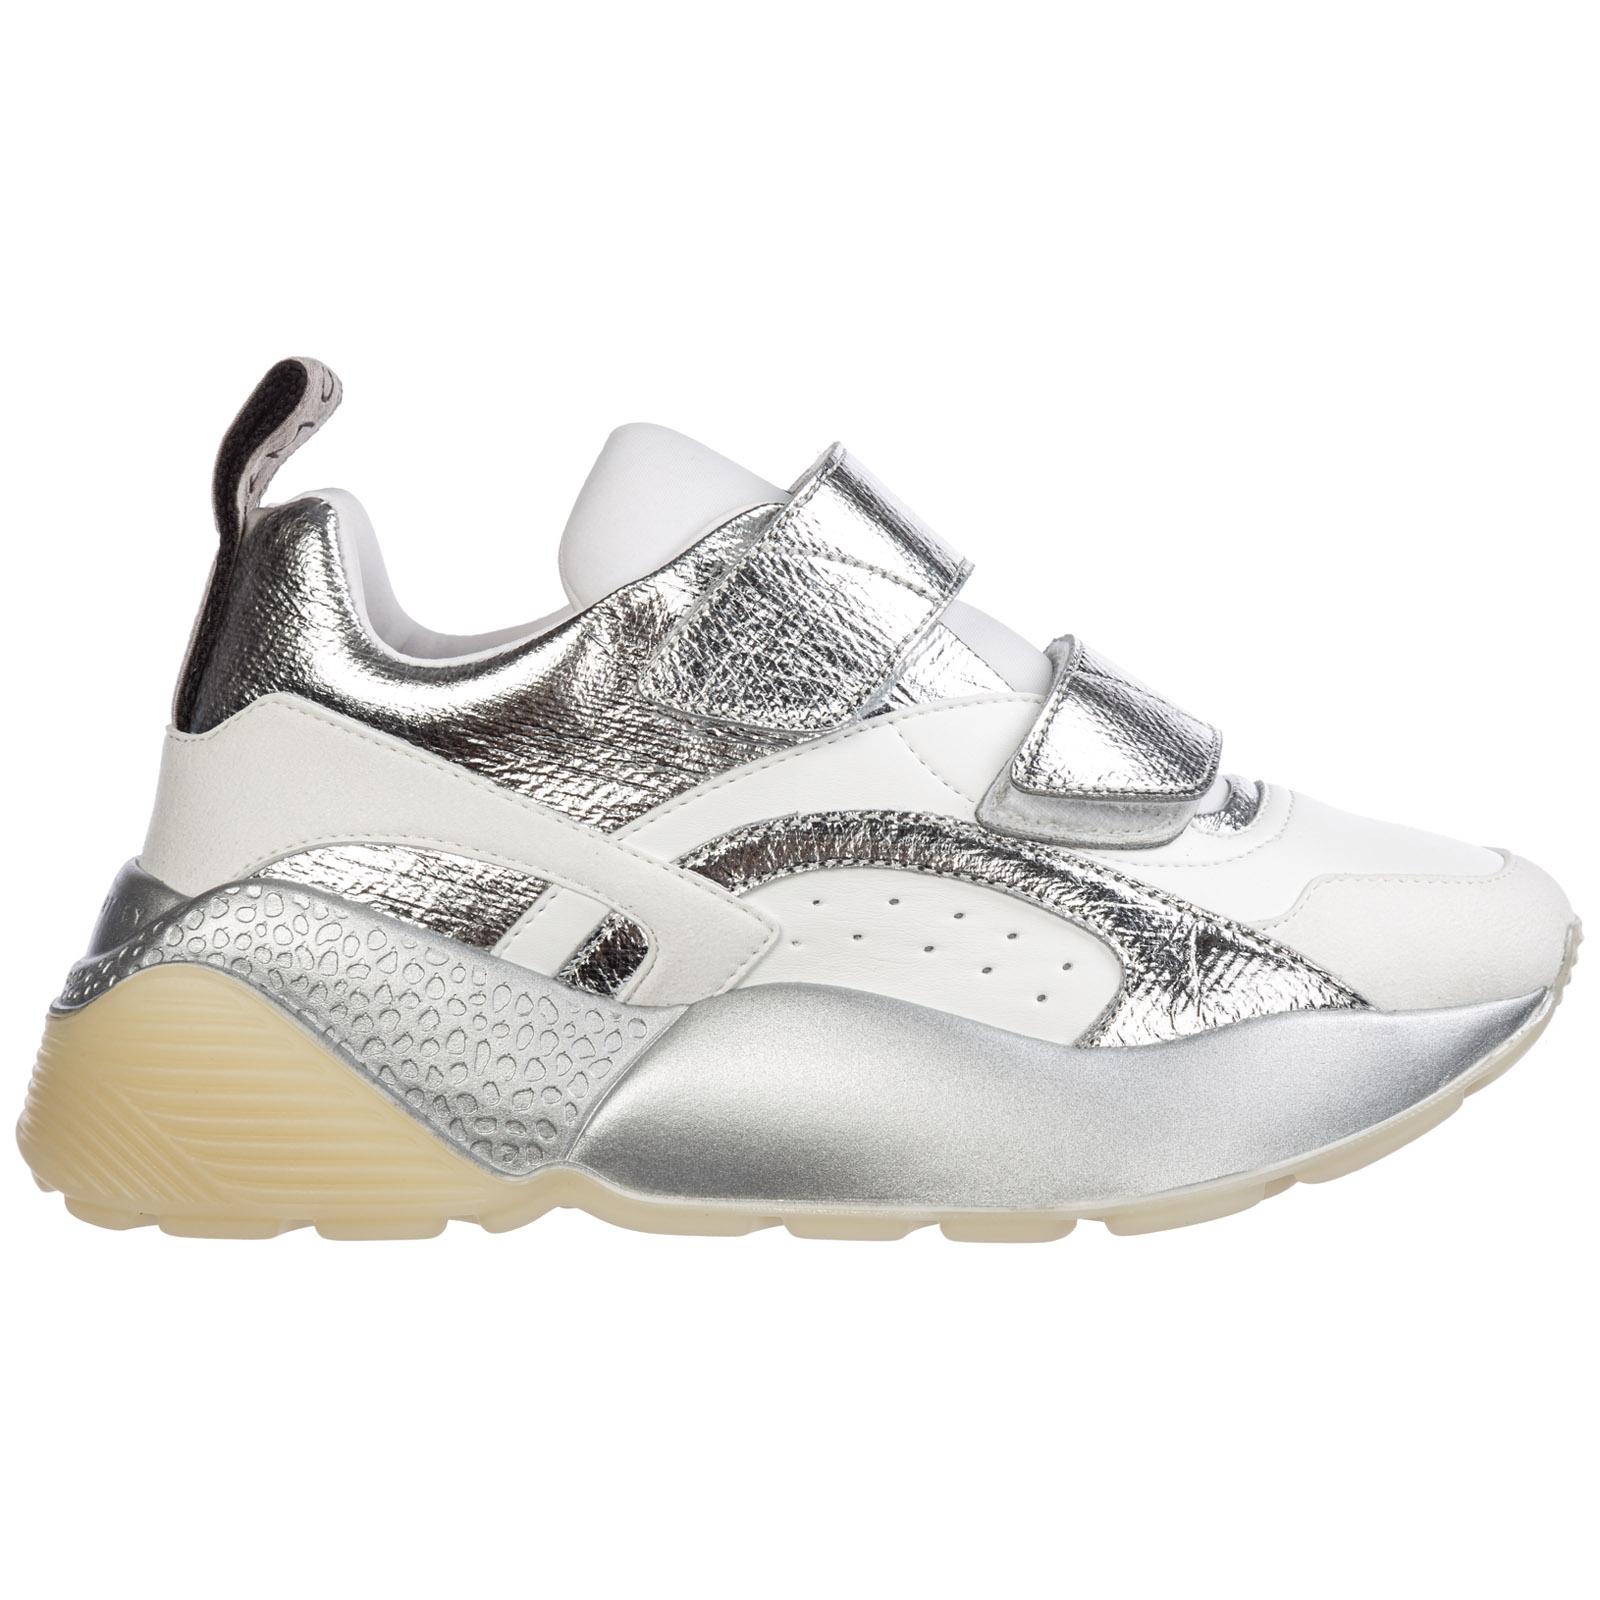 Stati Uniti sporchi online scarpe da skate buona vendita Sneakers Stella Mccartney eclypse 491513w188v9029 bianco | FRMODA.com